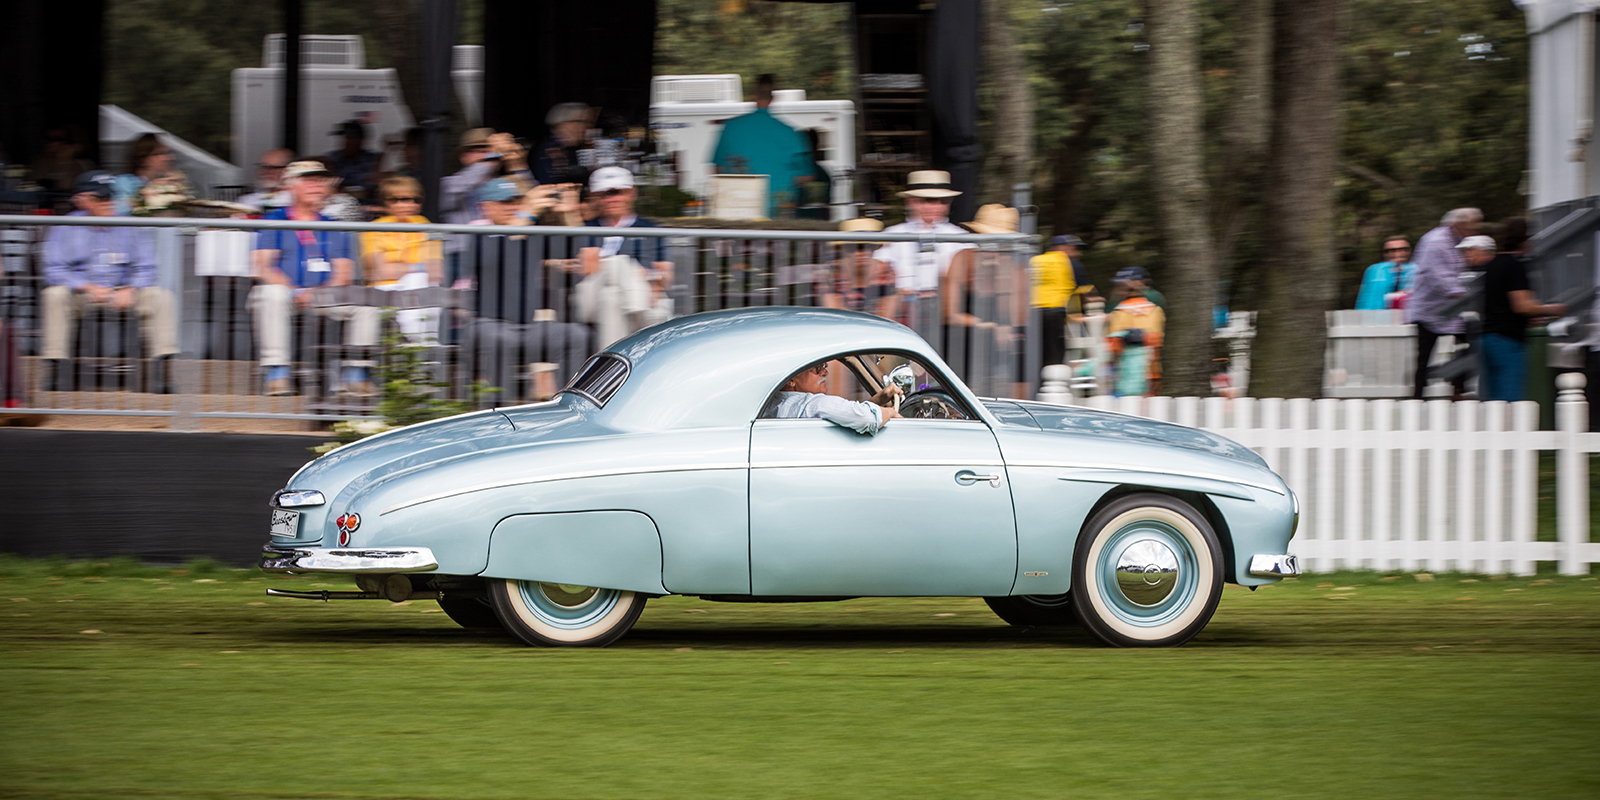 2019 VW - Amelia Concours 110A - Deremer Studios LLC